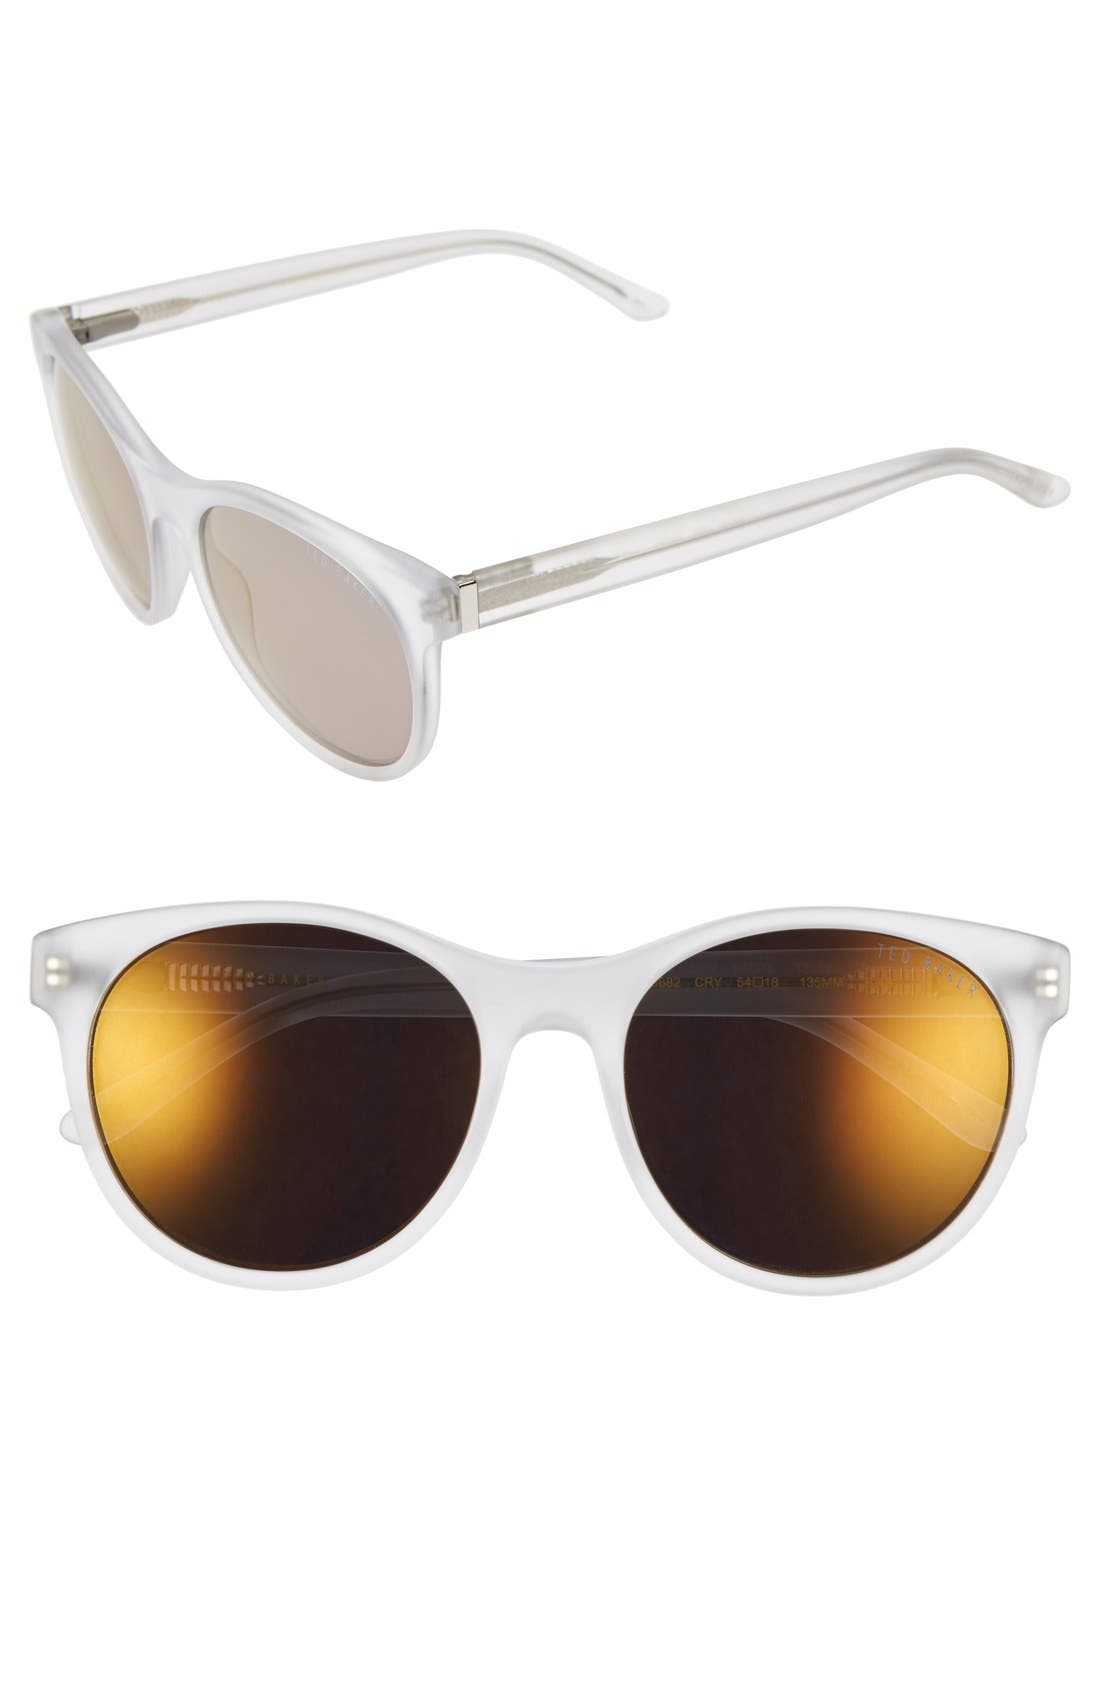 54mm Retro Sunglasses,                             Main thumbnail 3, color,